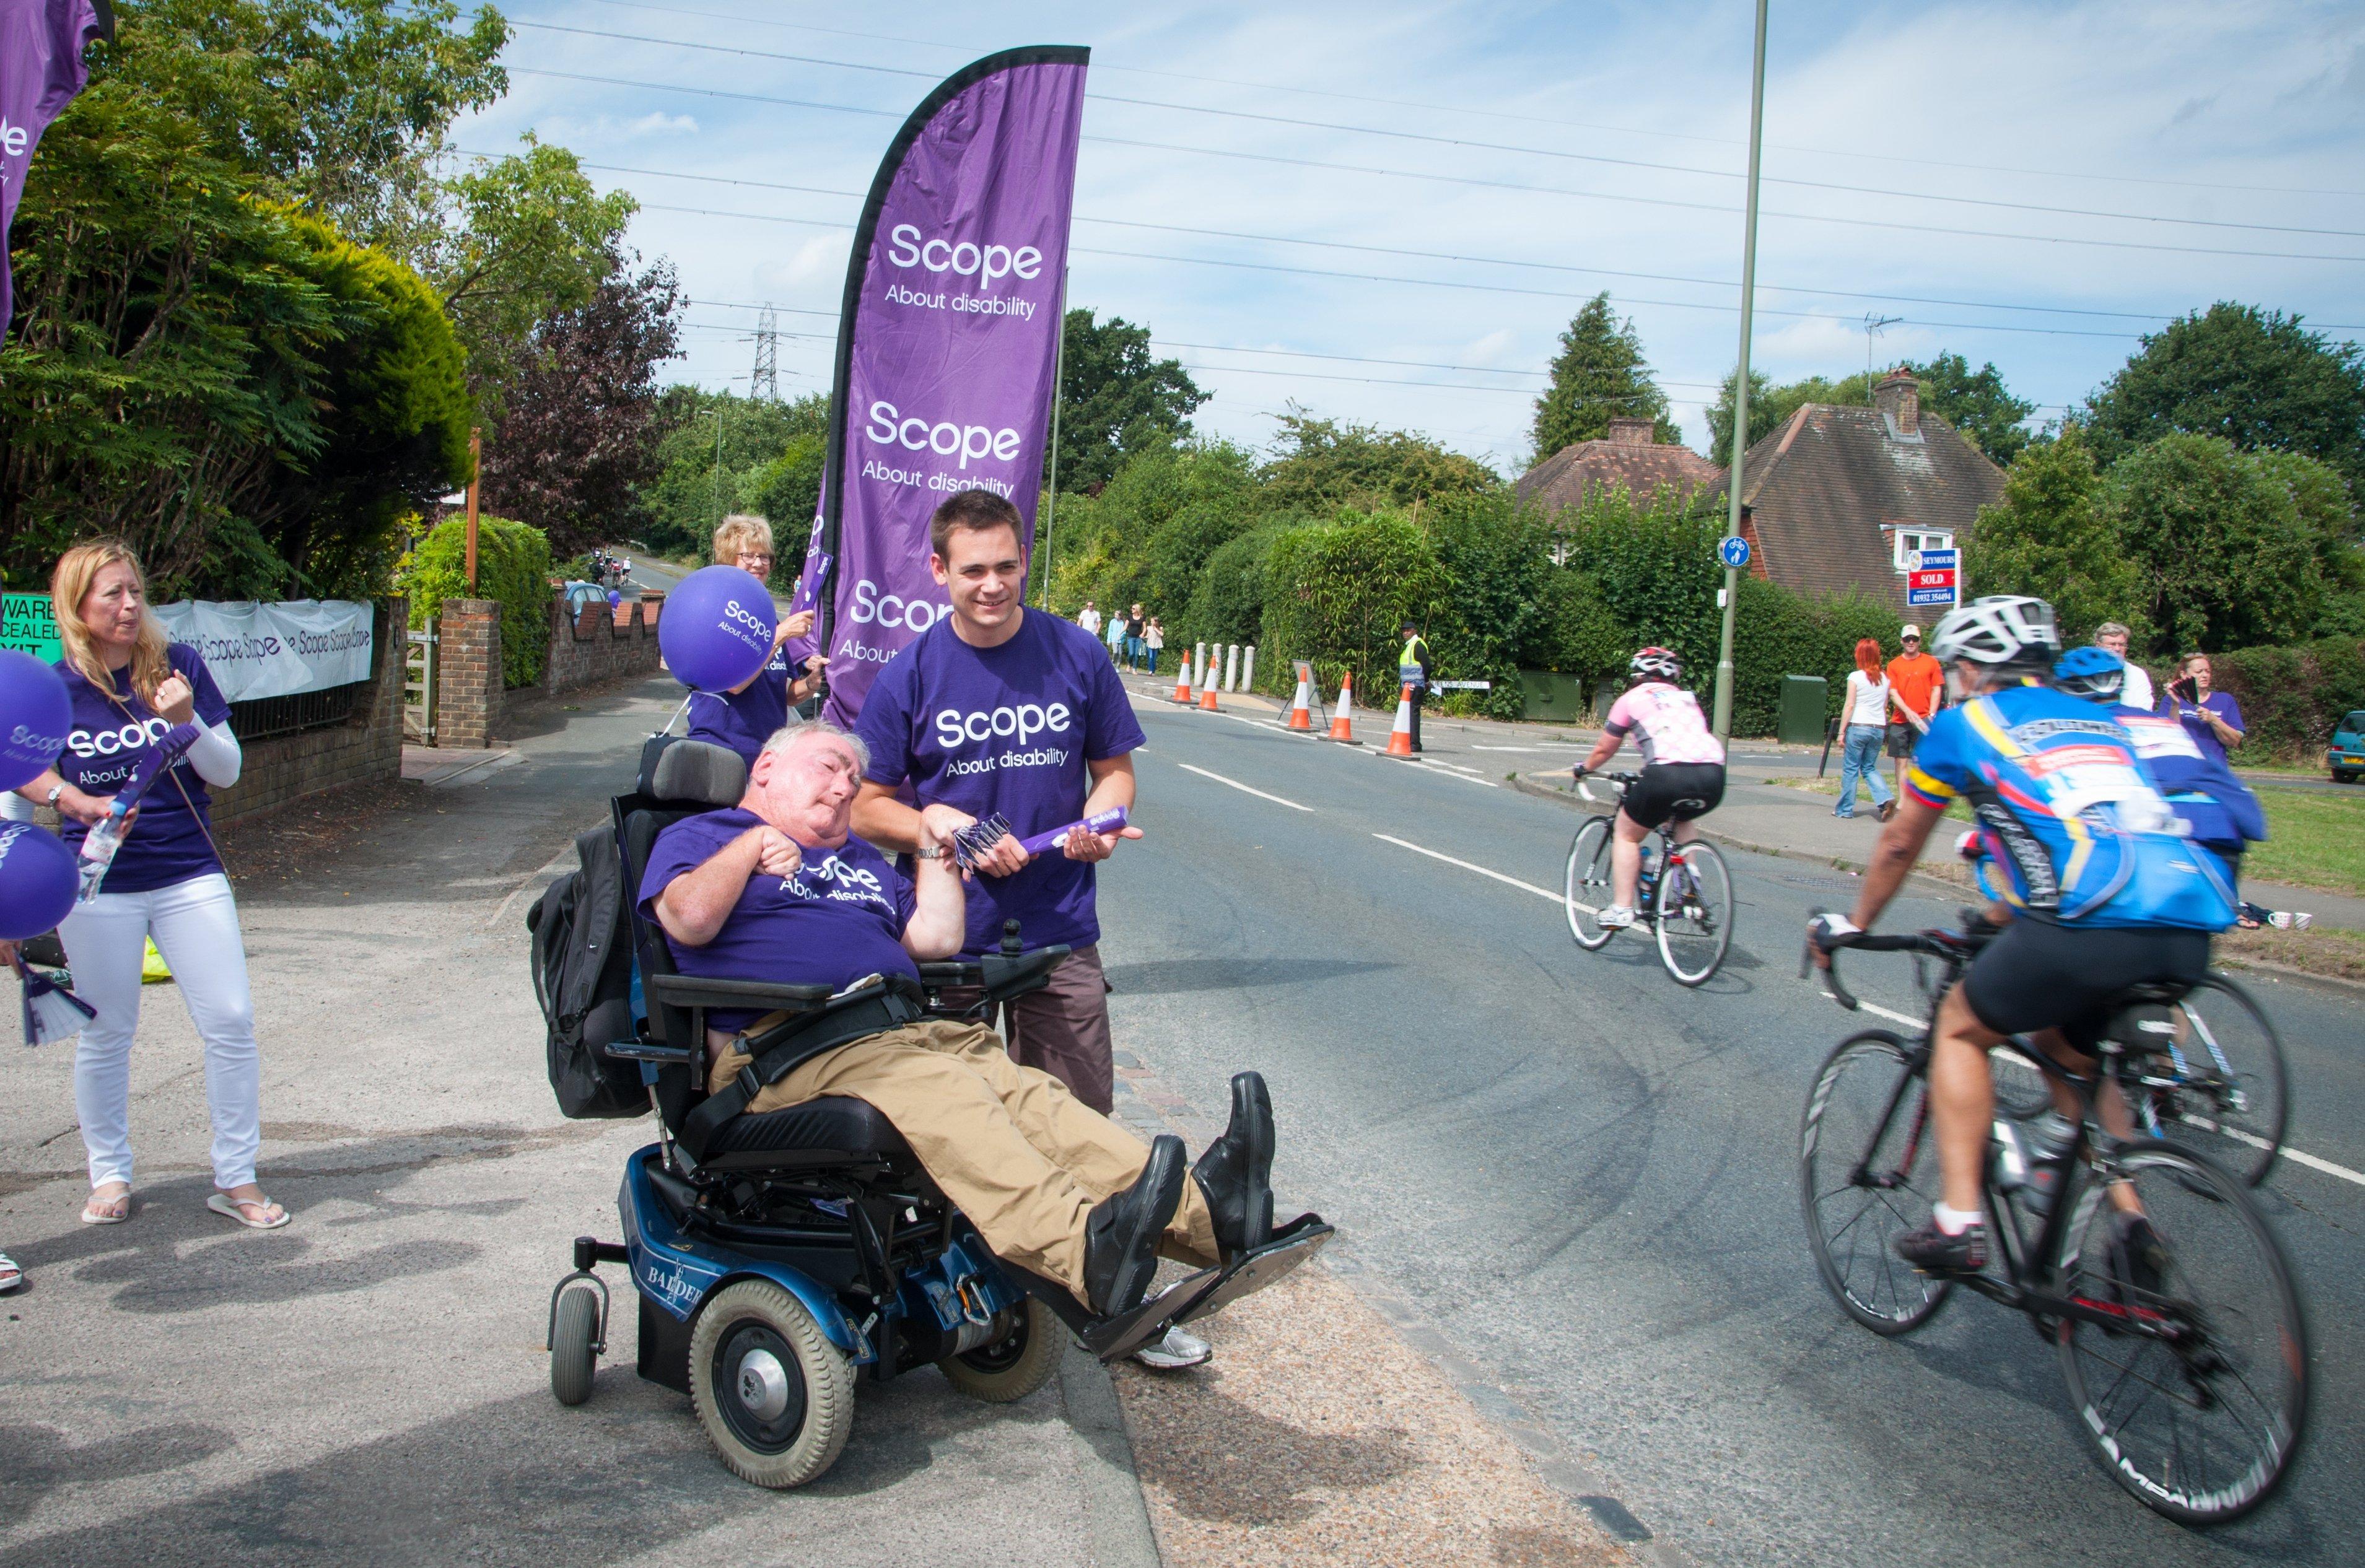 Scope volunteers cheer on cyclists